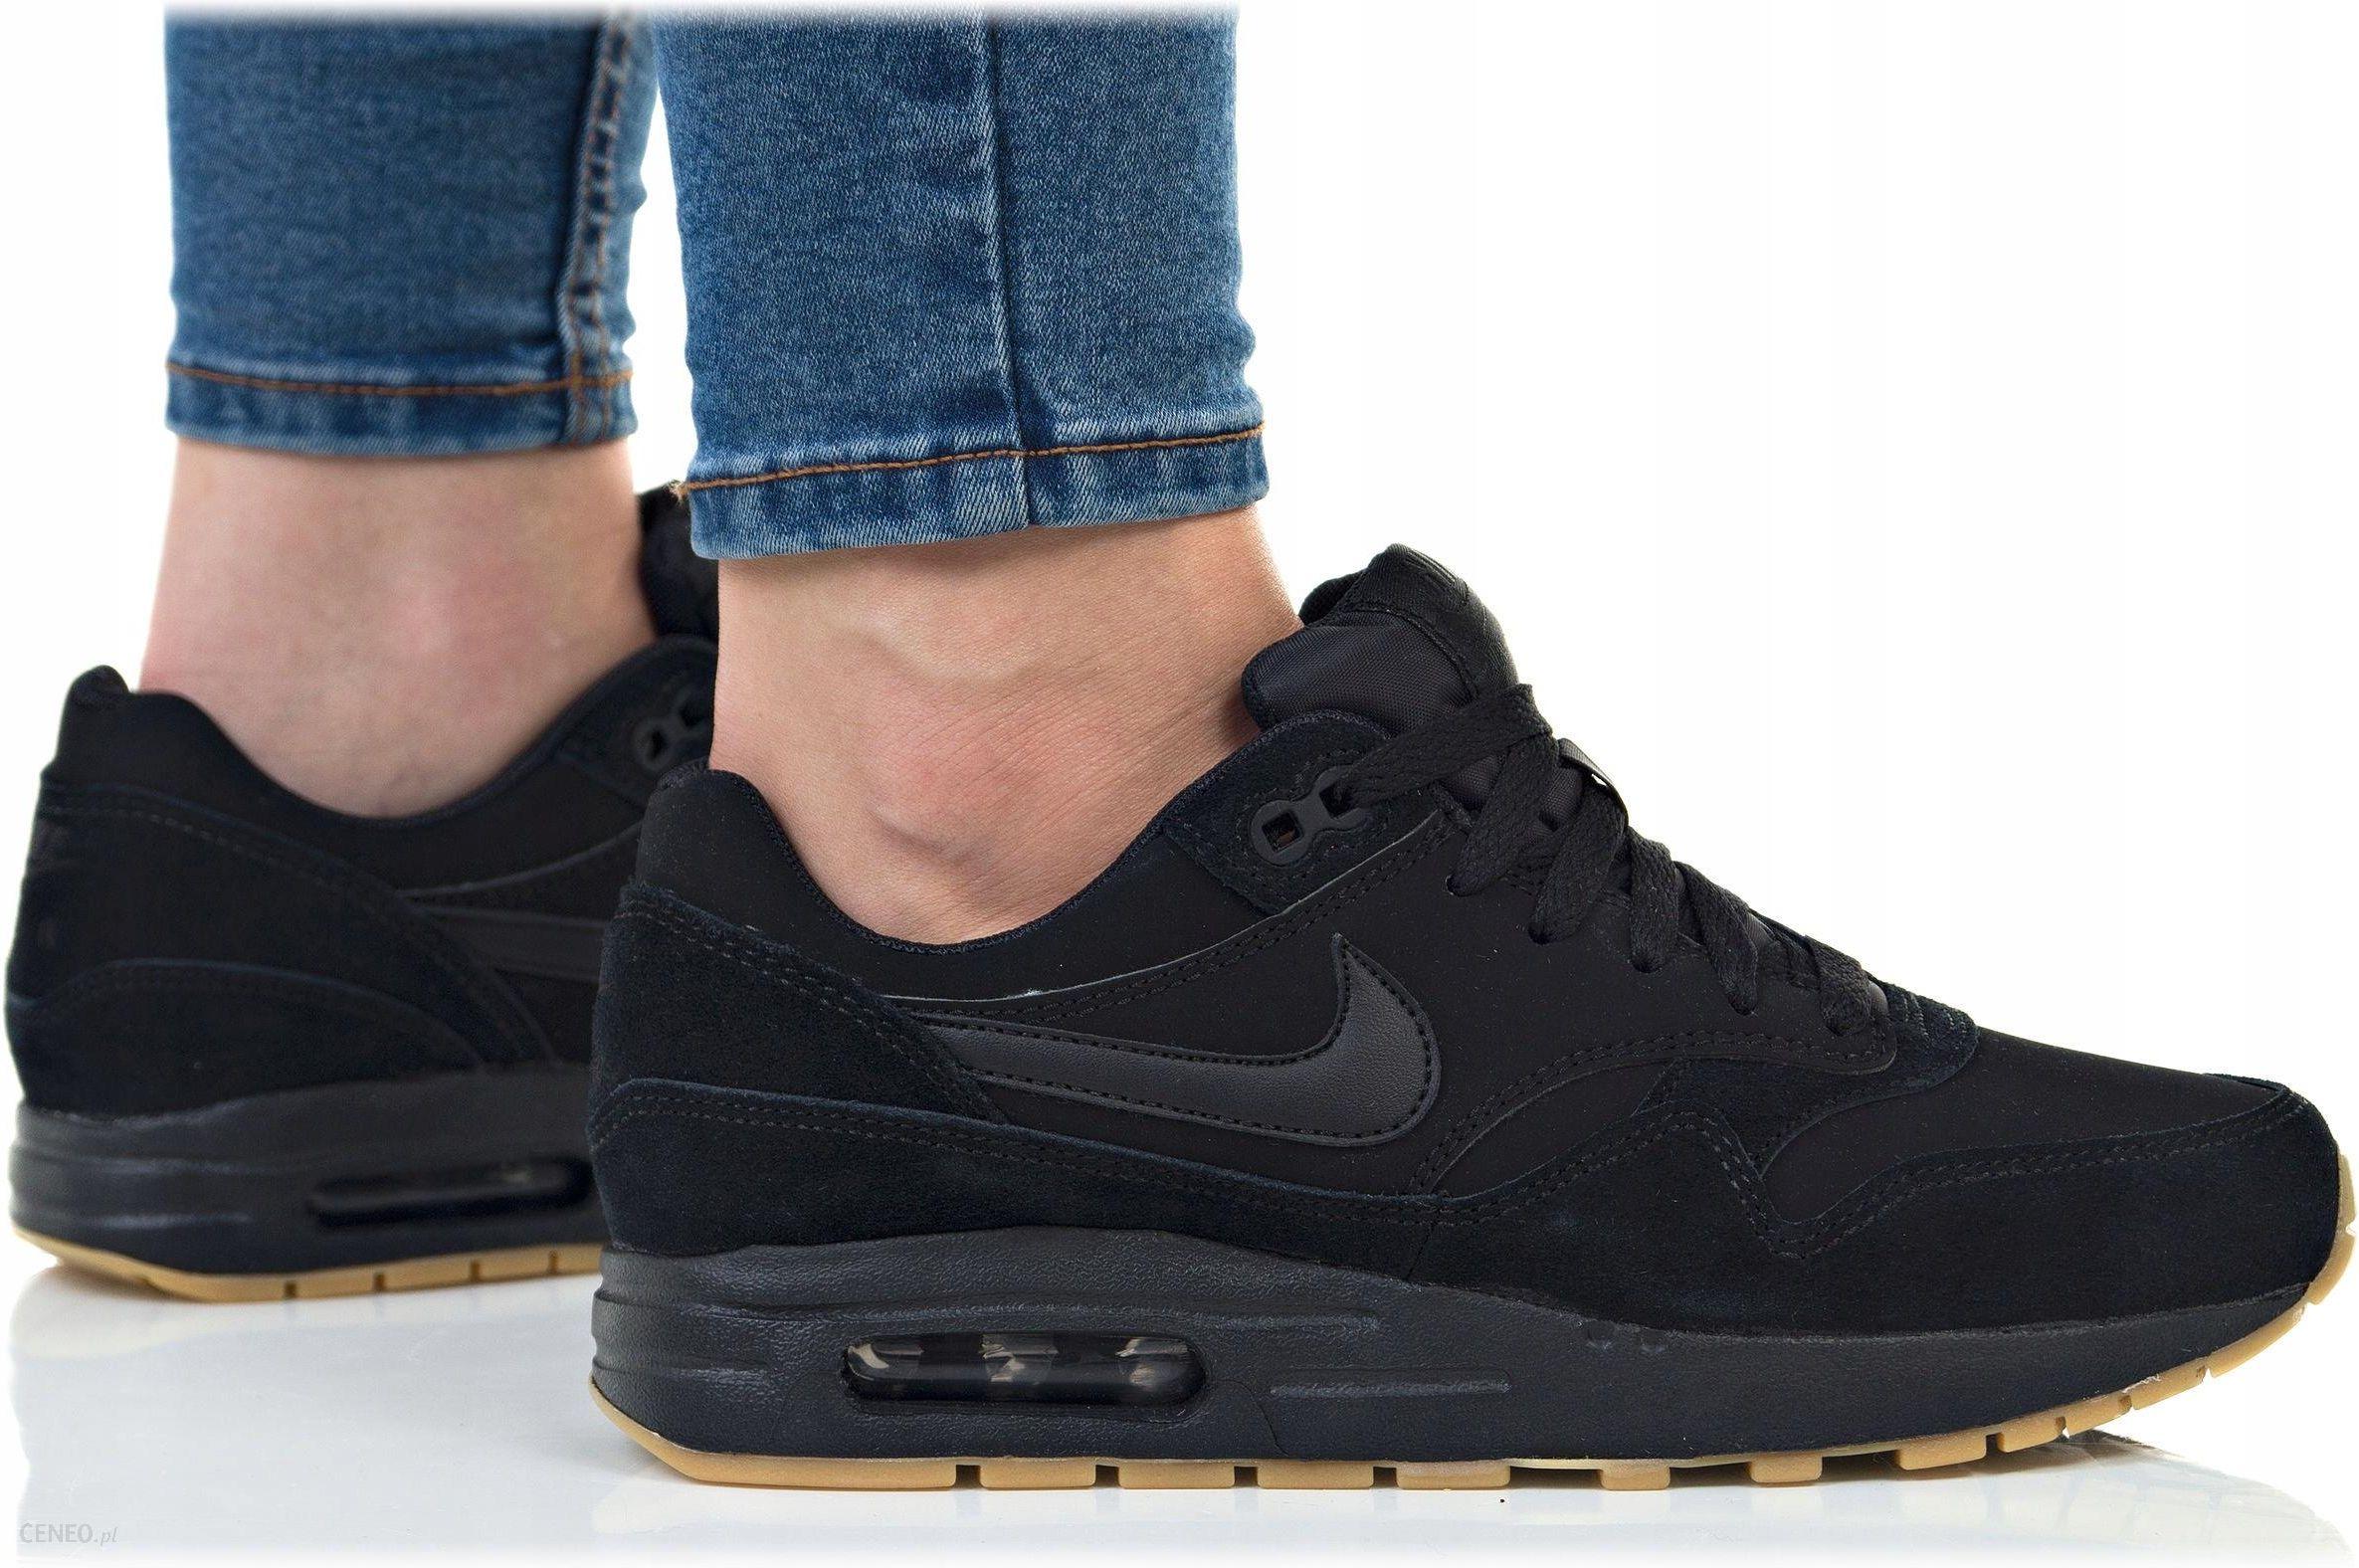 huge selection of a0c07 7069f Buty Nike Damskie Air Max 1 (gs) 807602-008 Czarne - zdjęcie 1